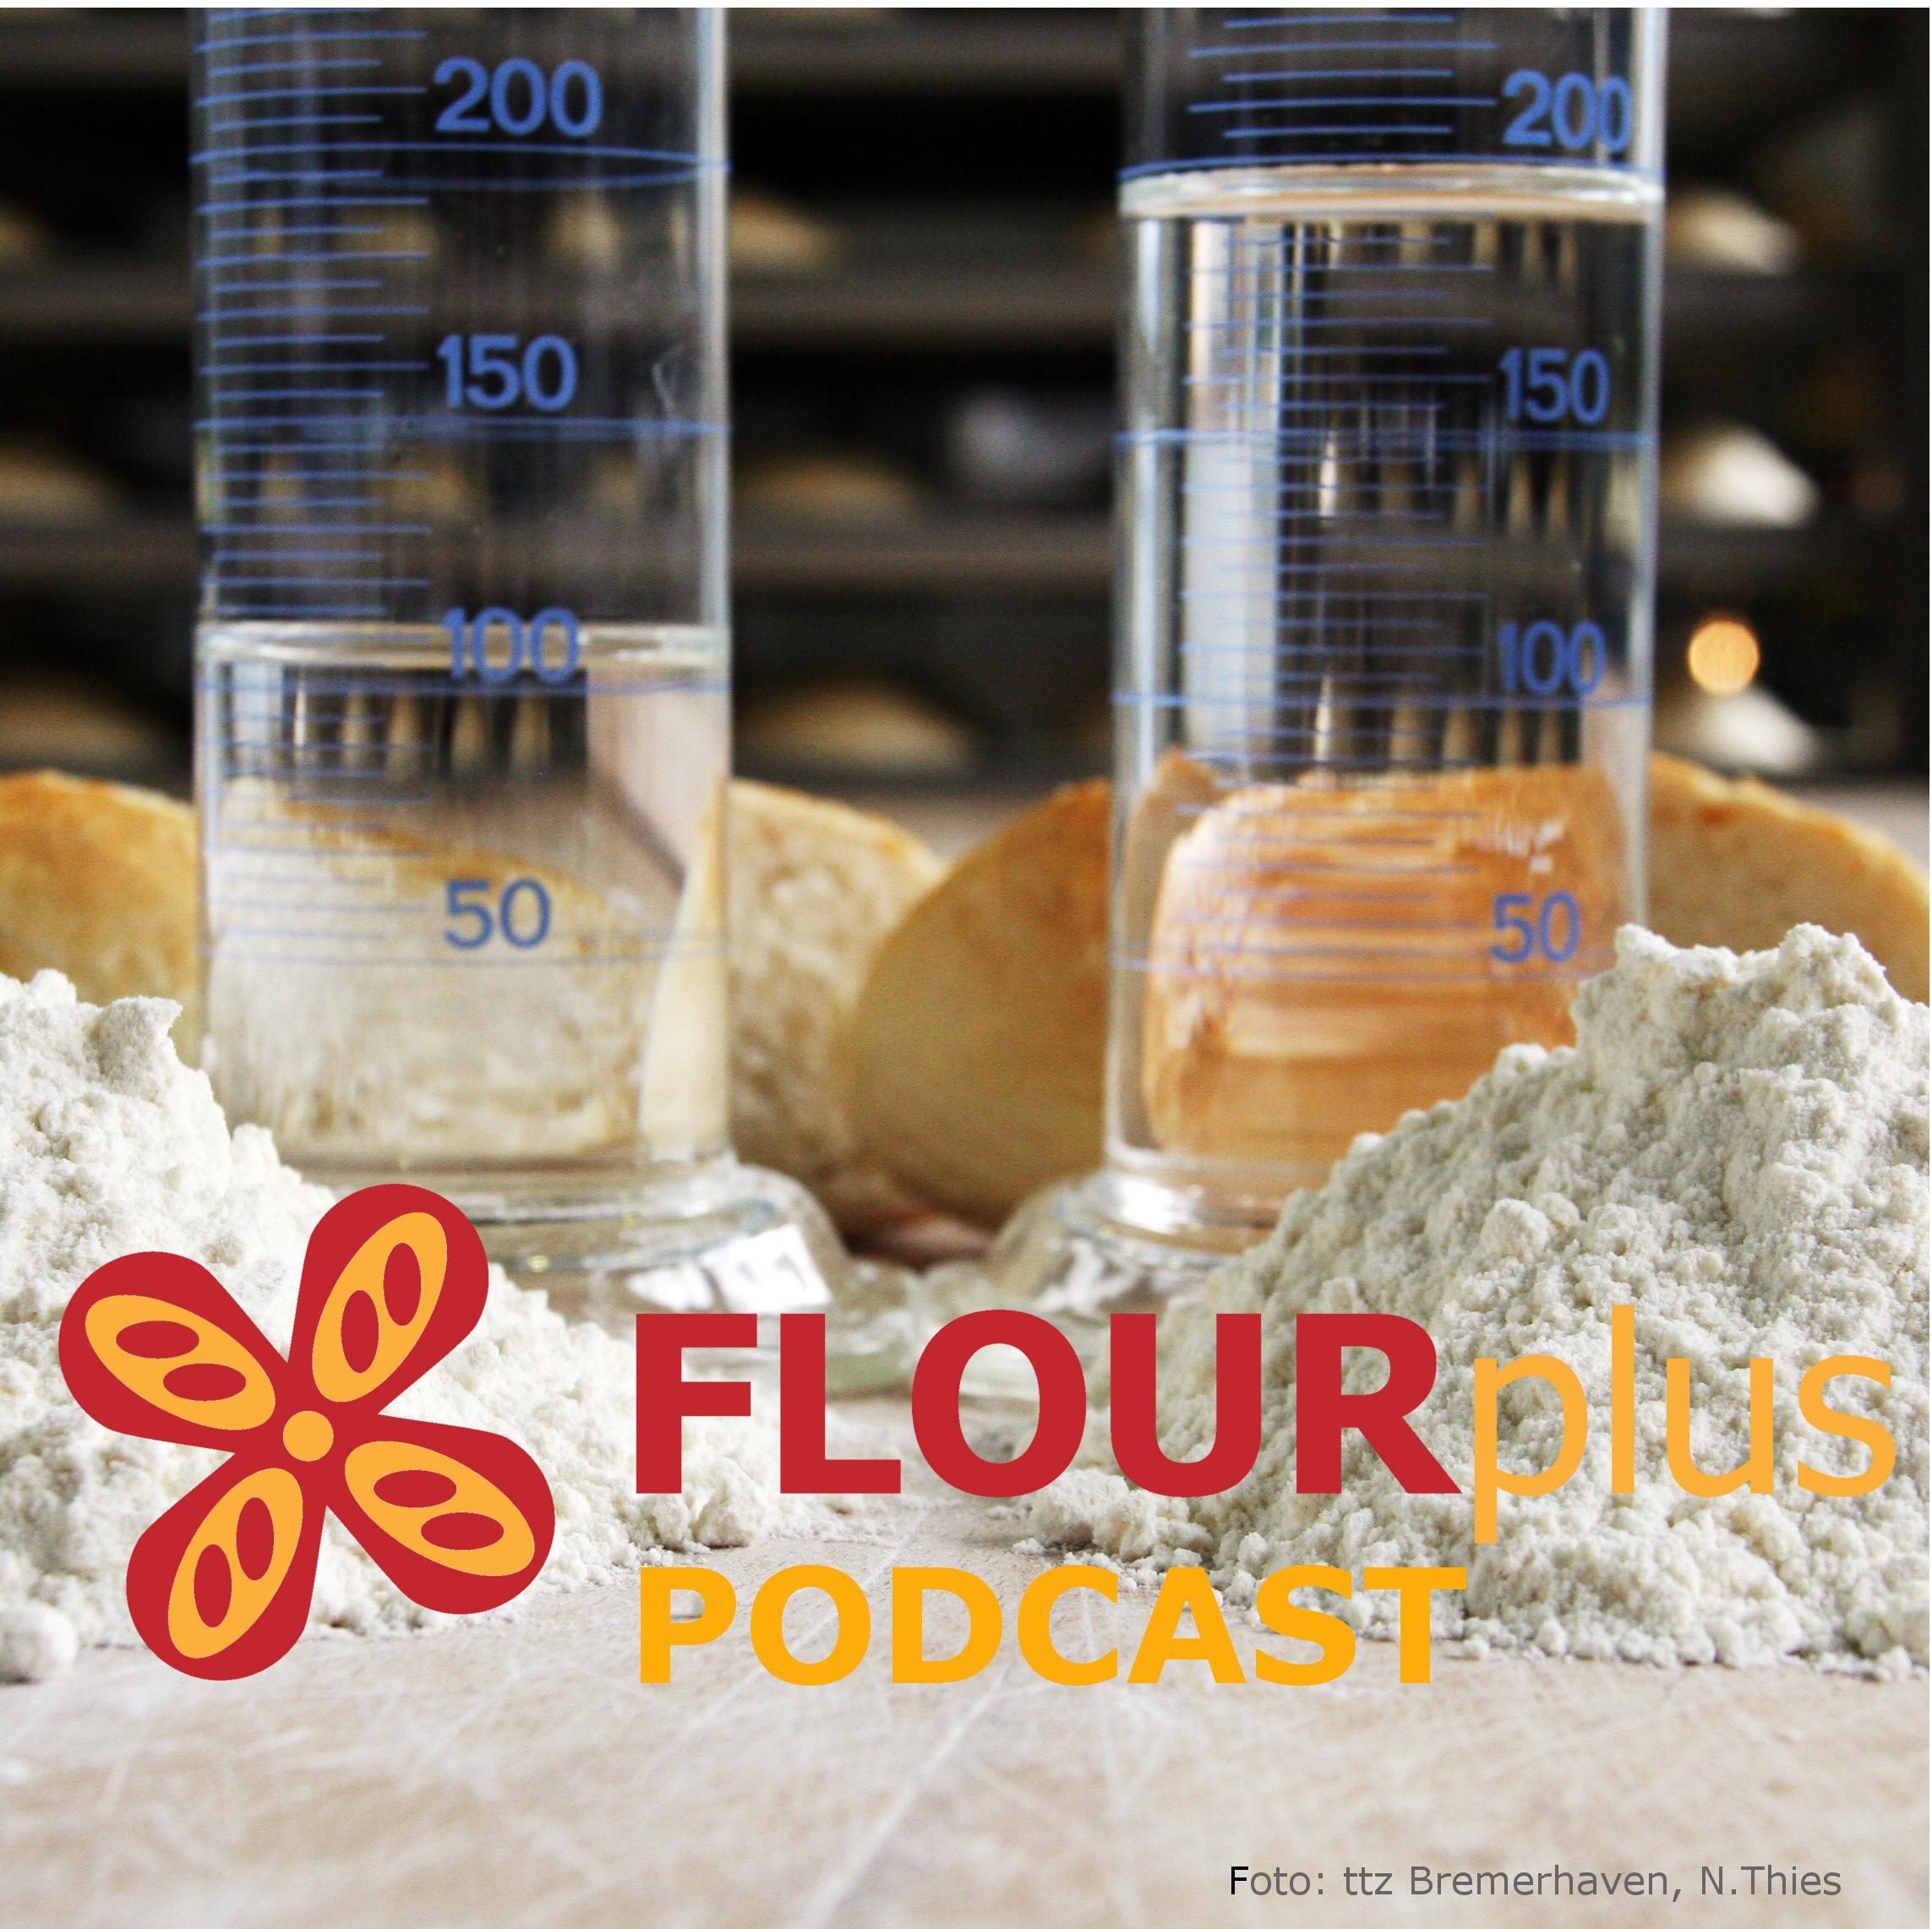 FLOURplus Podcast